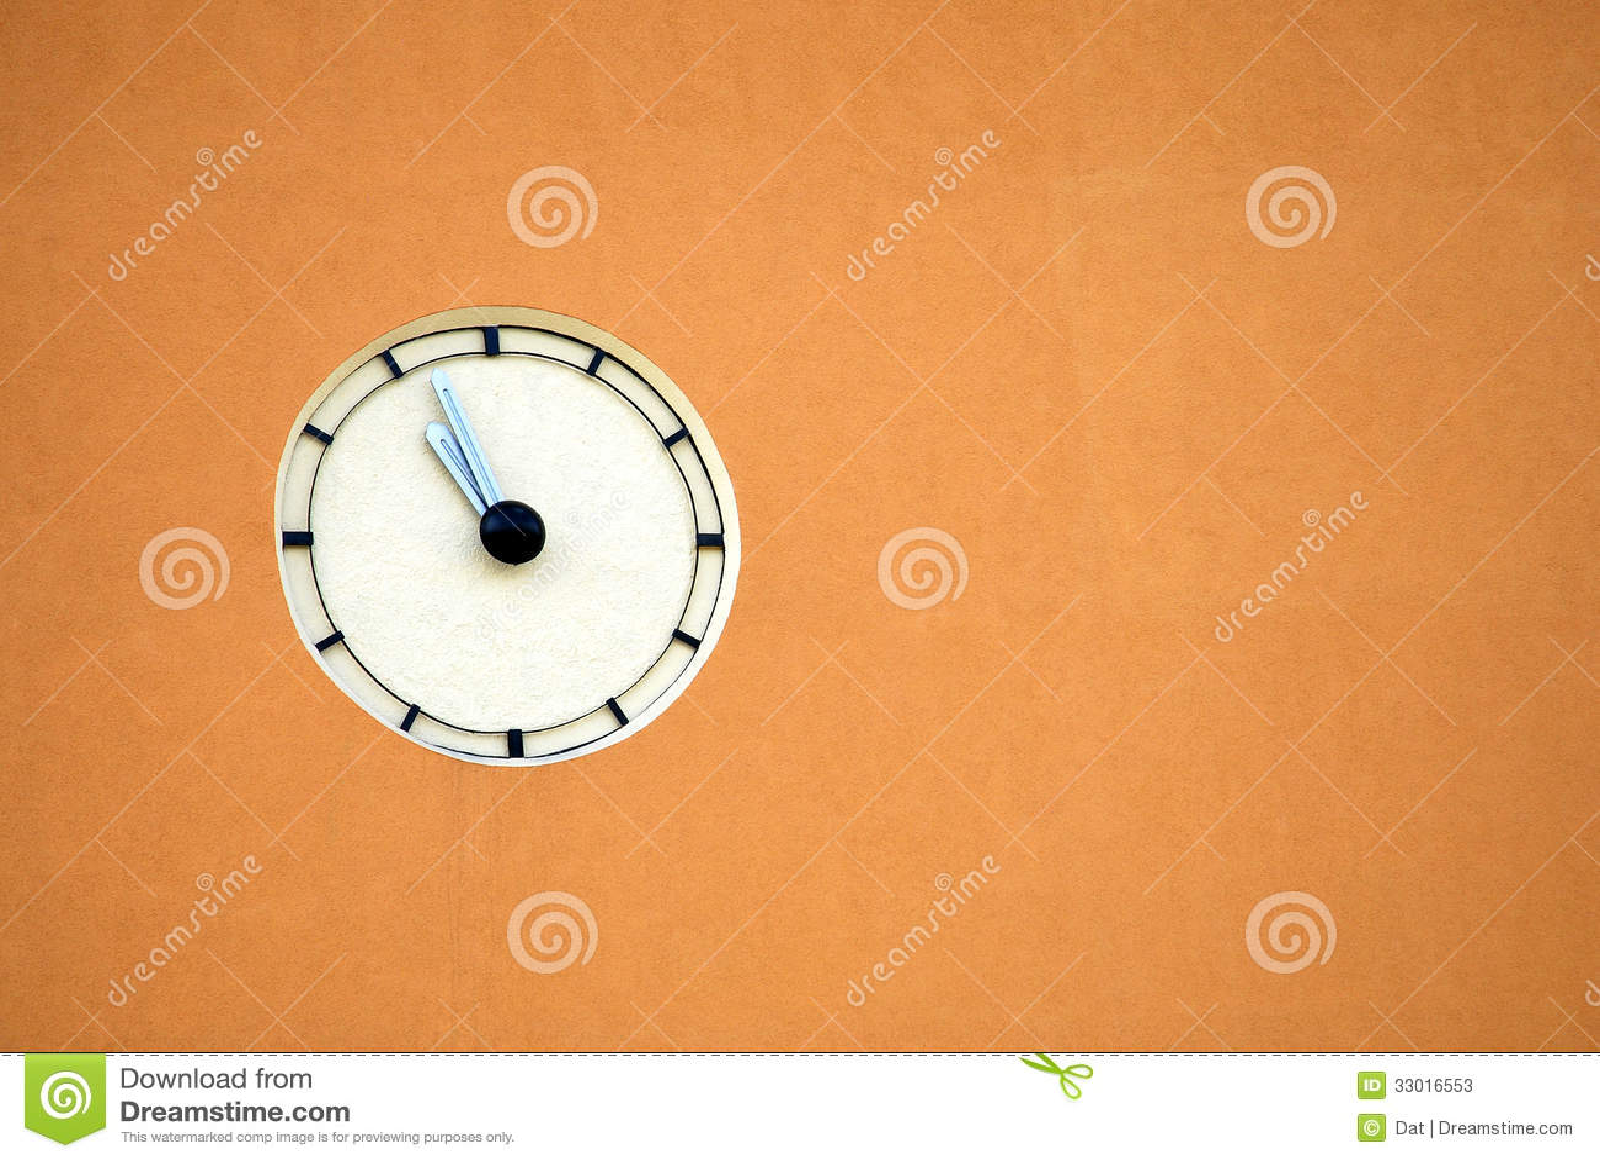 Wall Clock Stock Image Image Of Timekeeper Urban Hands 33016553